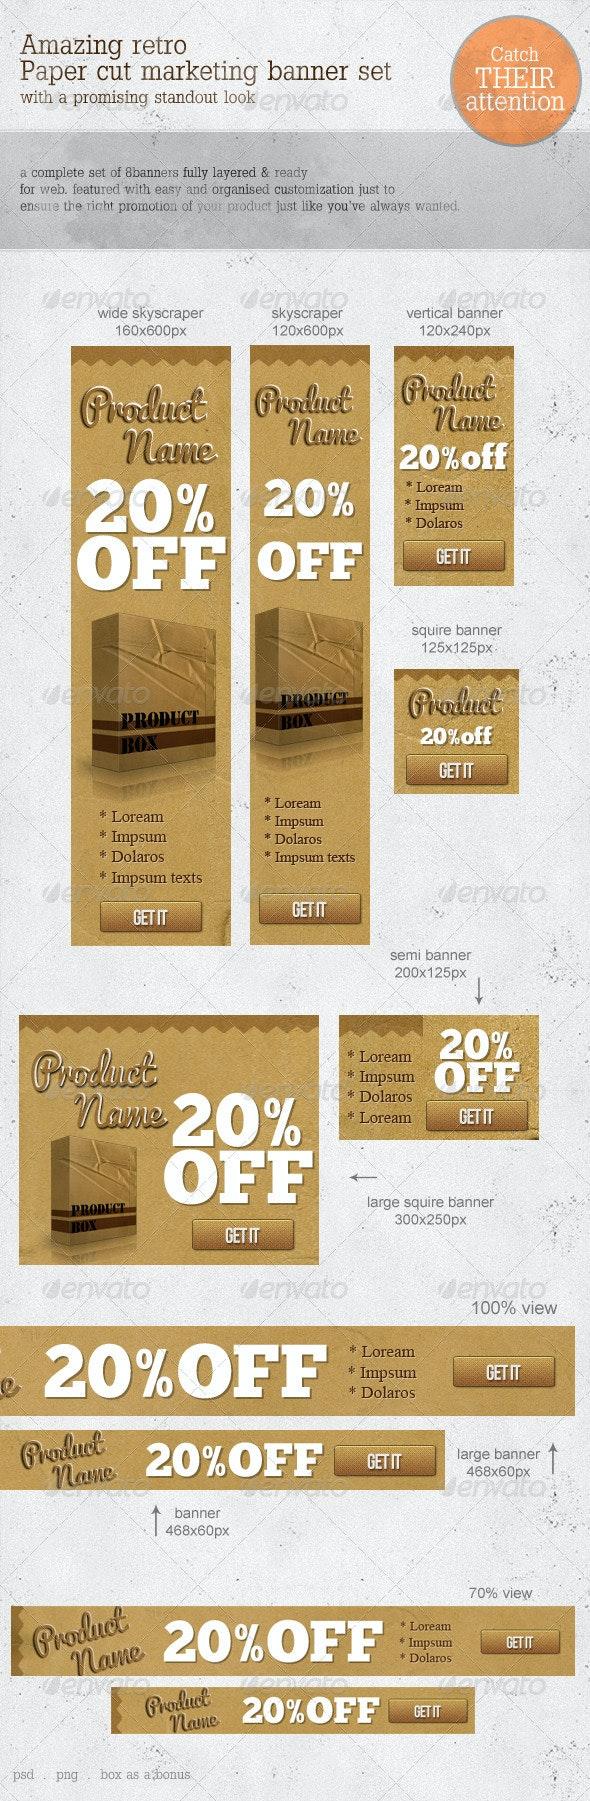 Retro Paper-cut Web Marketing Banners - Banners & Ads Web Elements